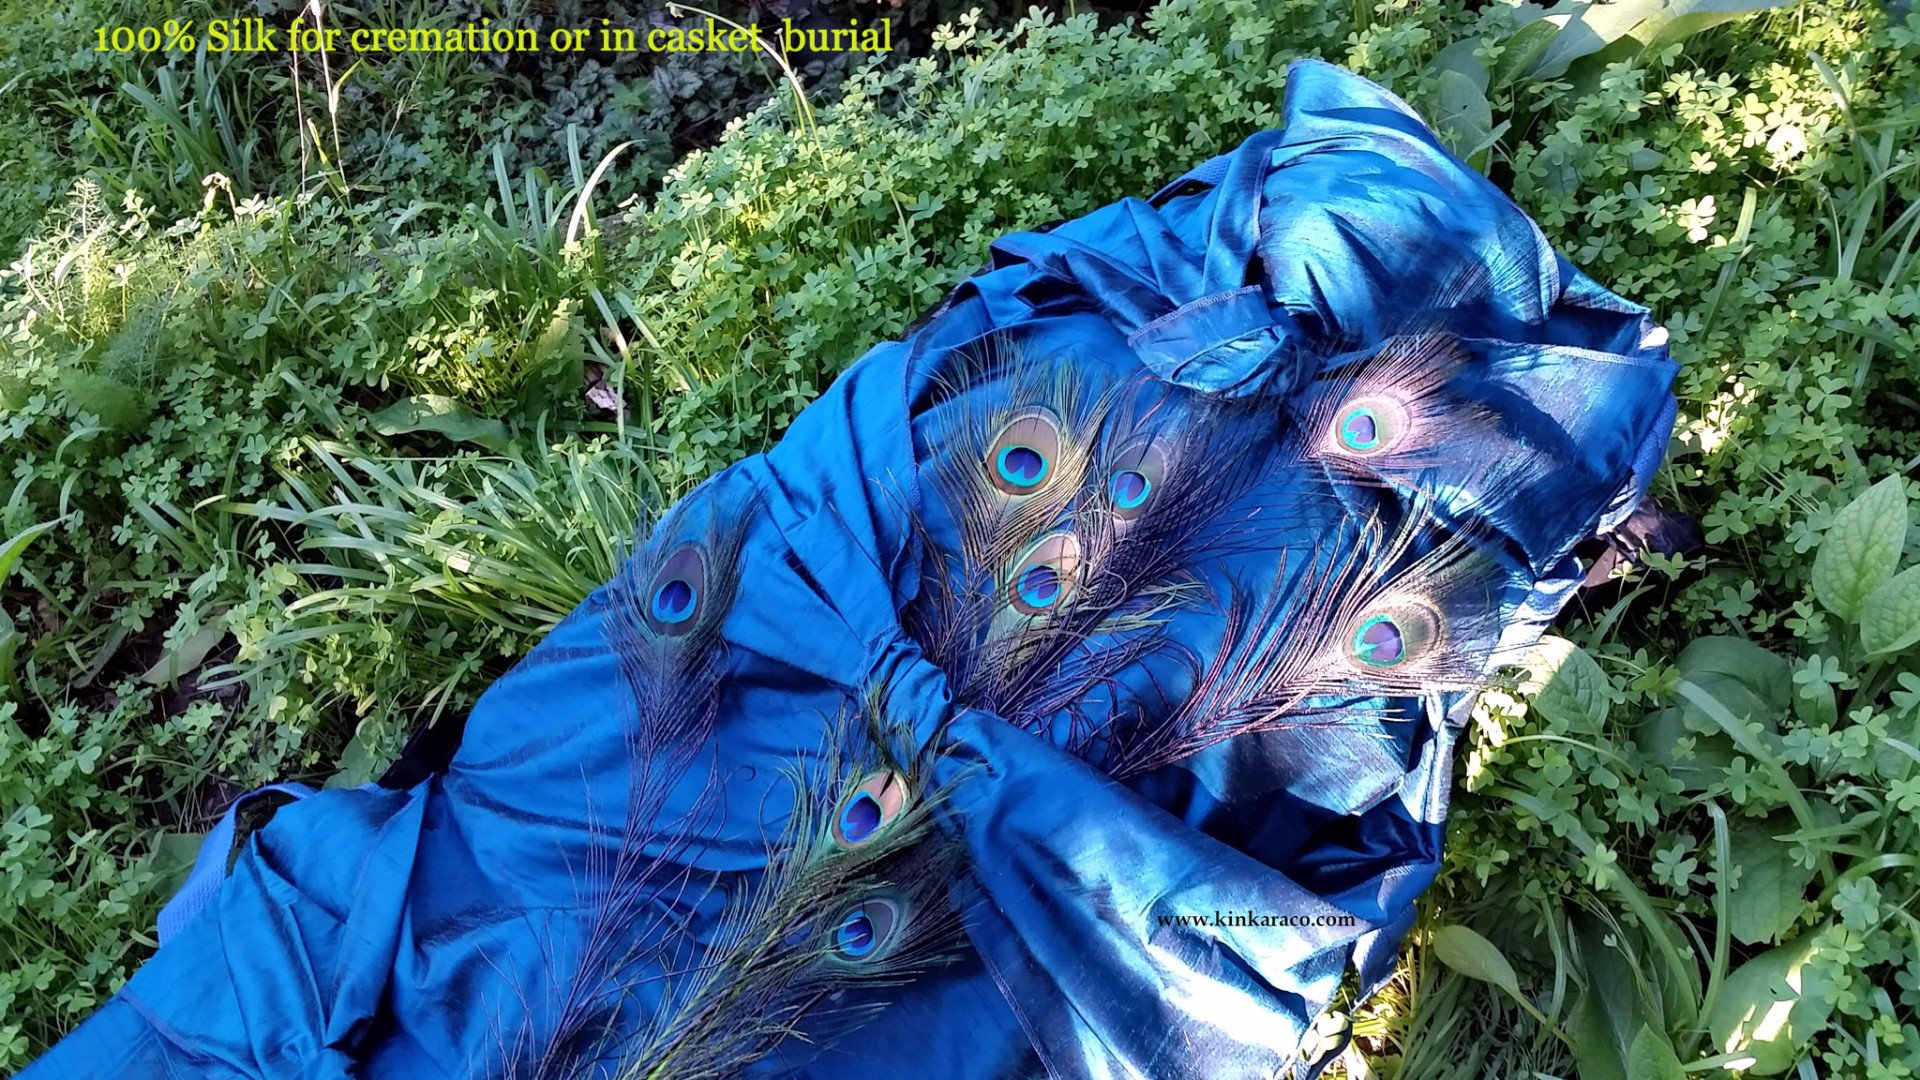 Peacock shroud by Esmerelda Kent of Kinkaraco.com.